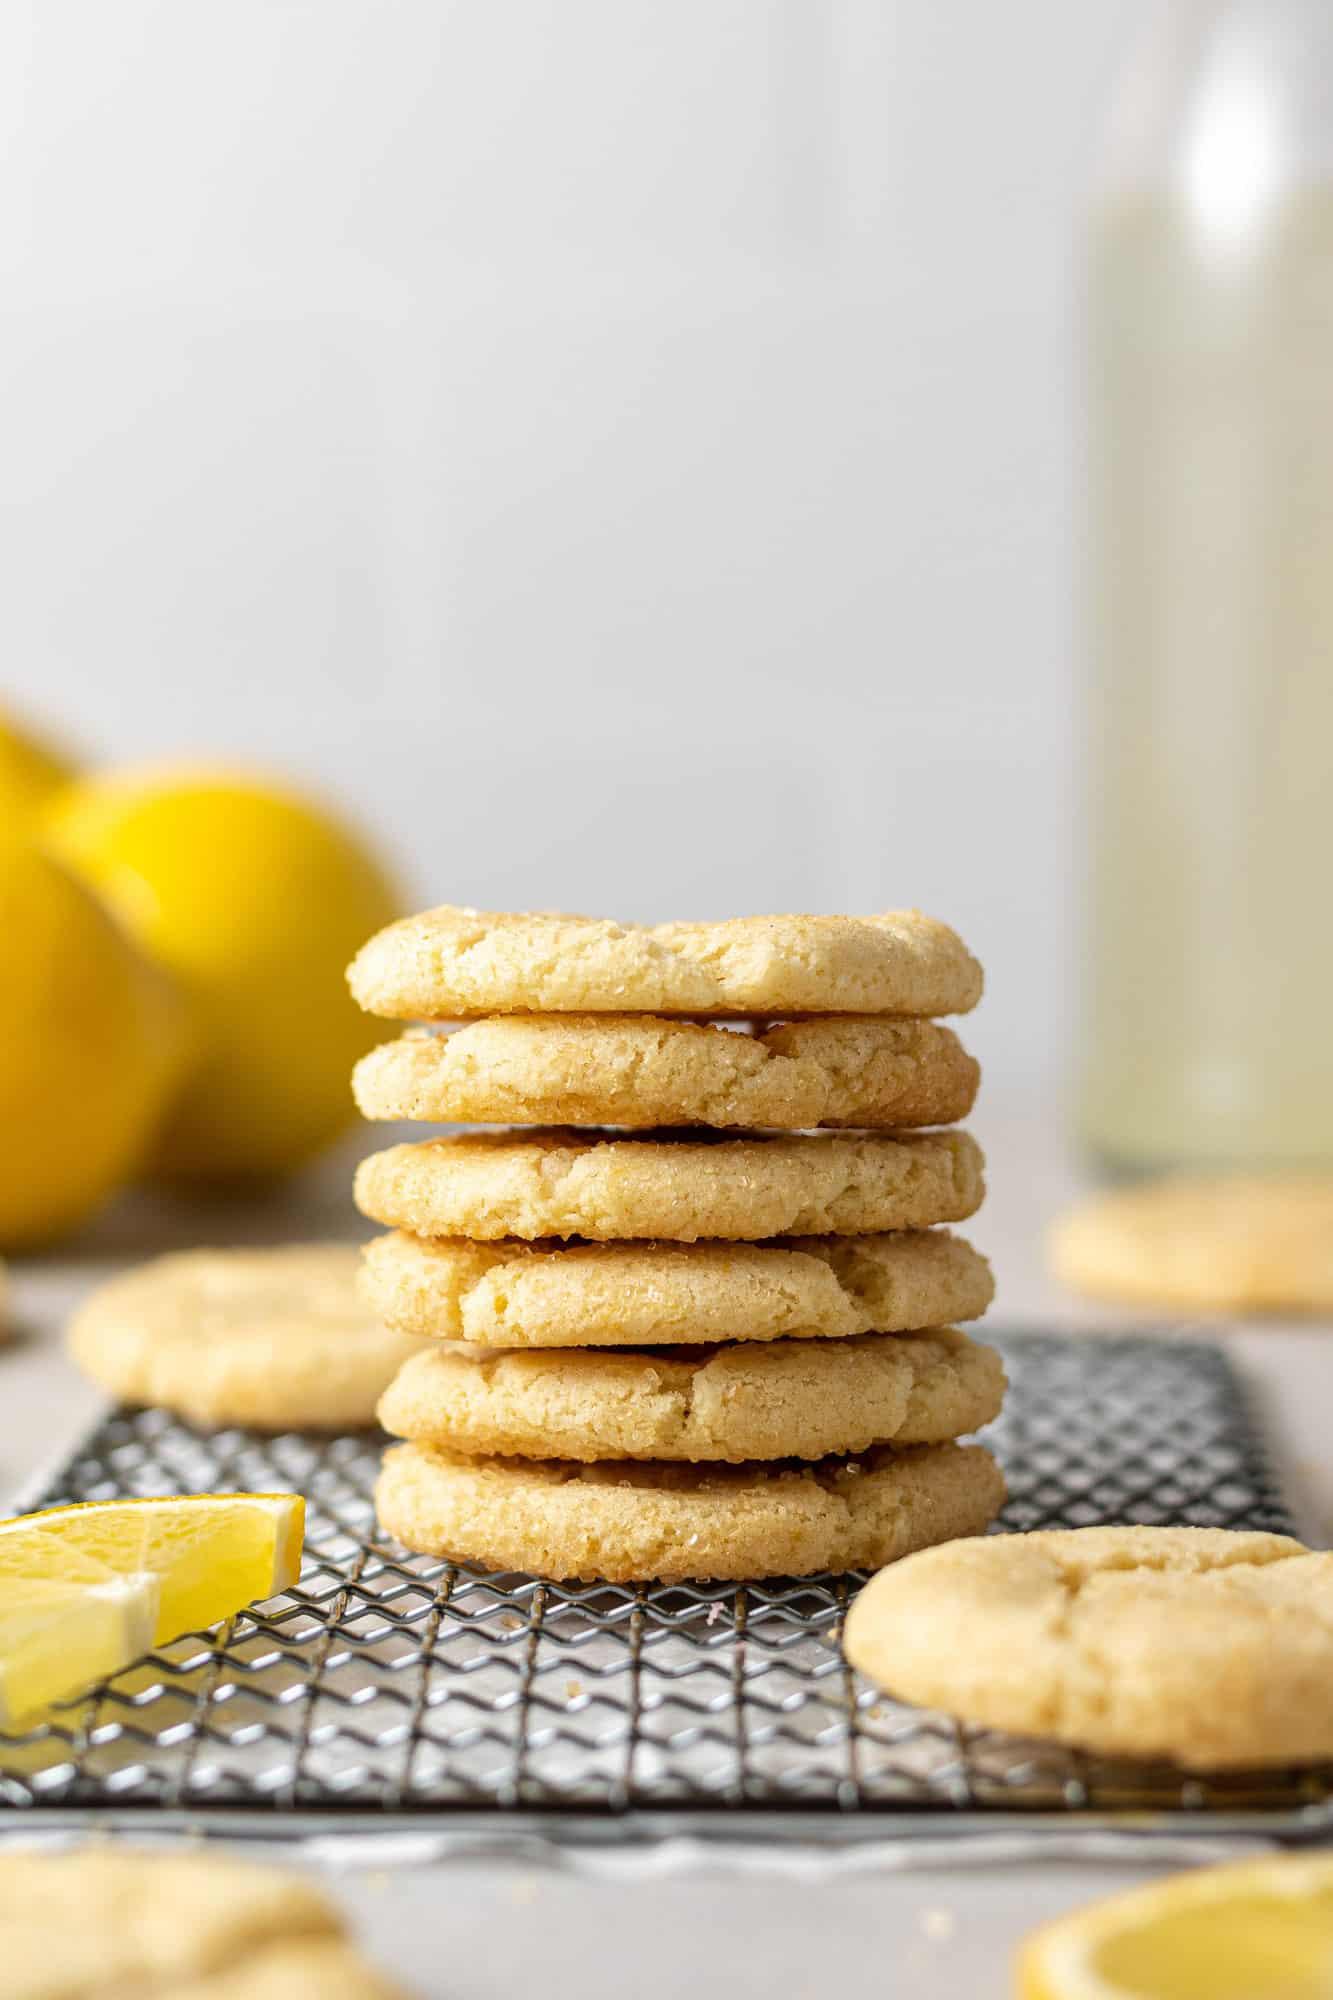 Lemon sugar cookies in a tall stack on wiring baking rack.